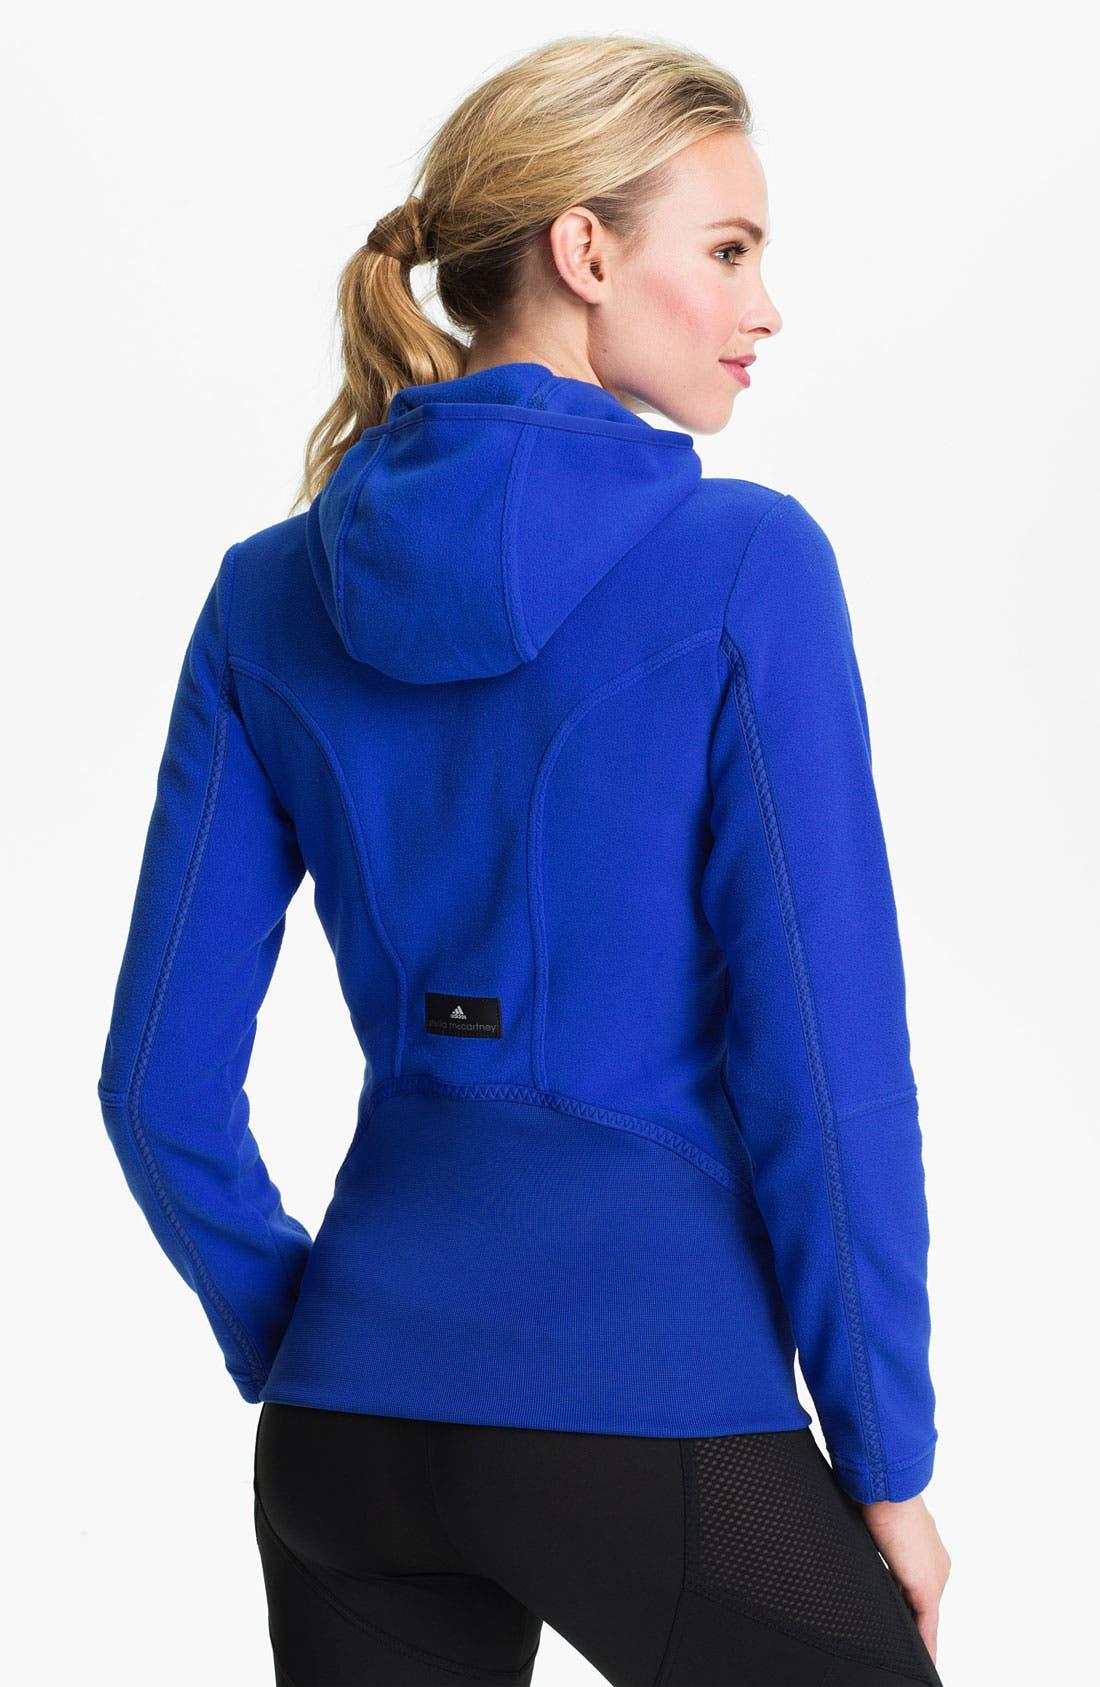 Alternate Image 2  - adidas by Stella McCartney 'Wintersports' Performance Fleece Jacket